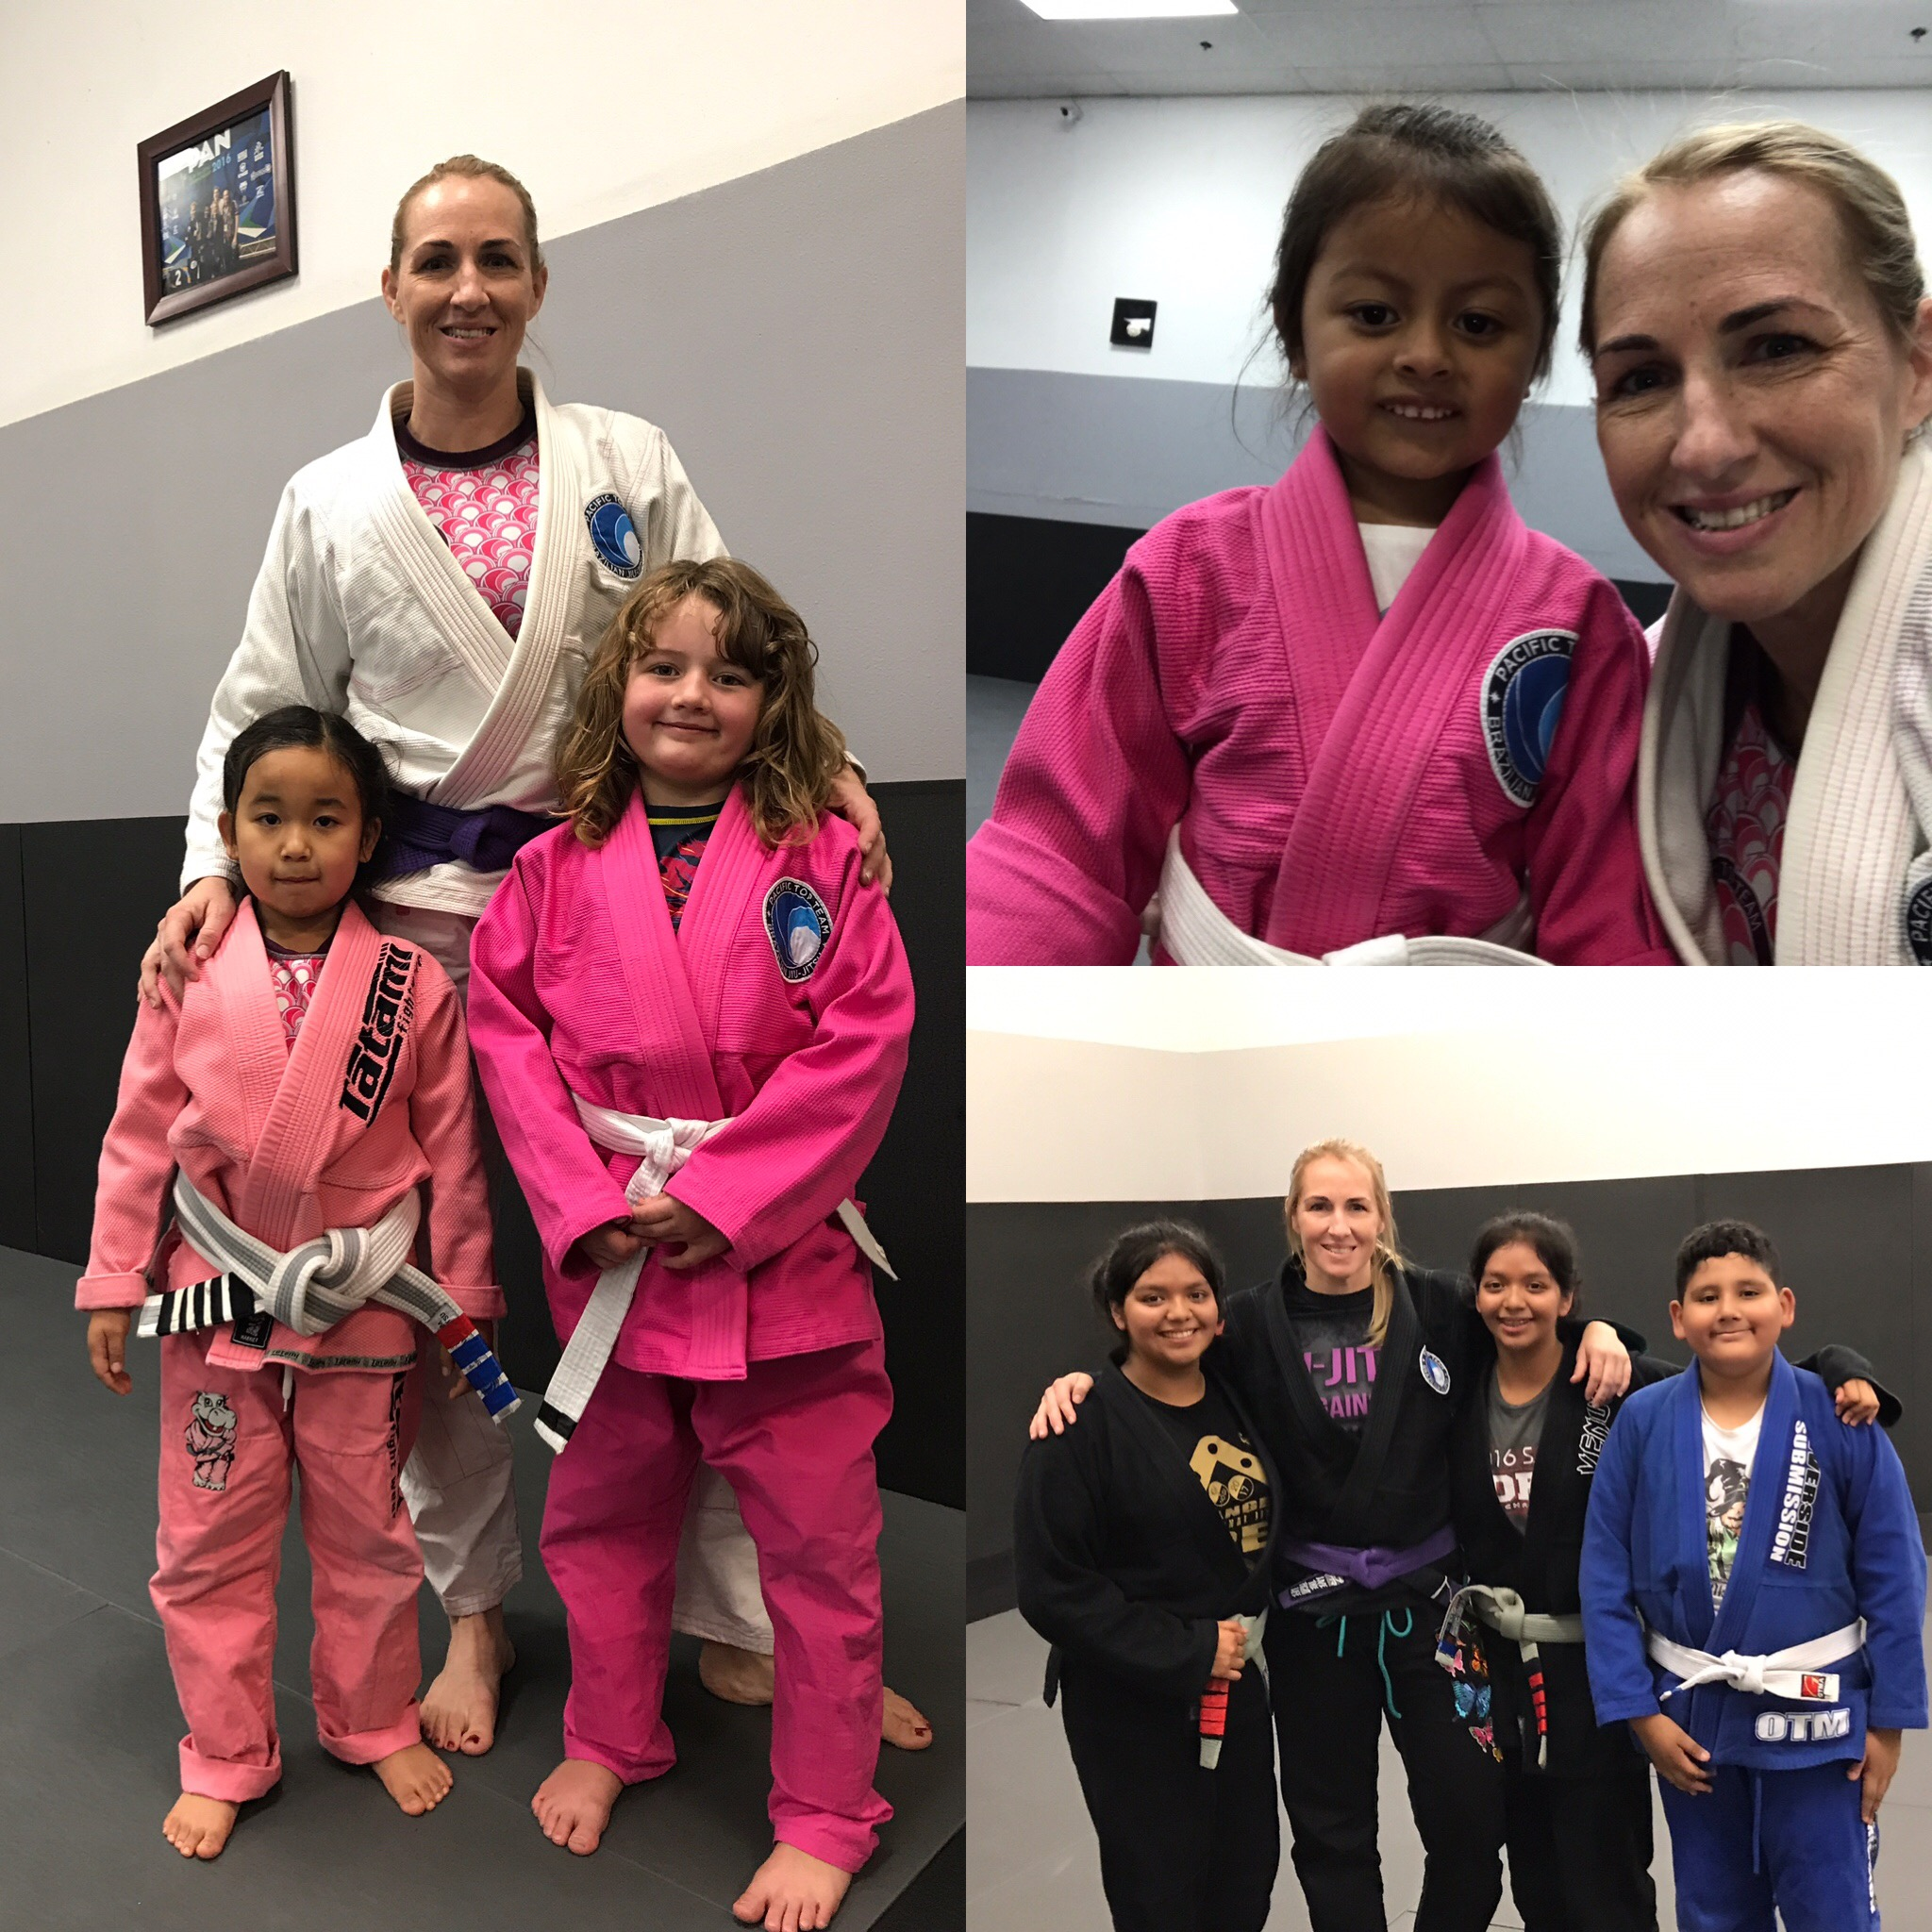 Congrats to Allison, Kelly, Melissa, Melinna, Luis and Catalaya!!!